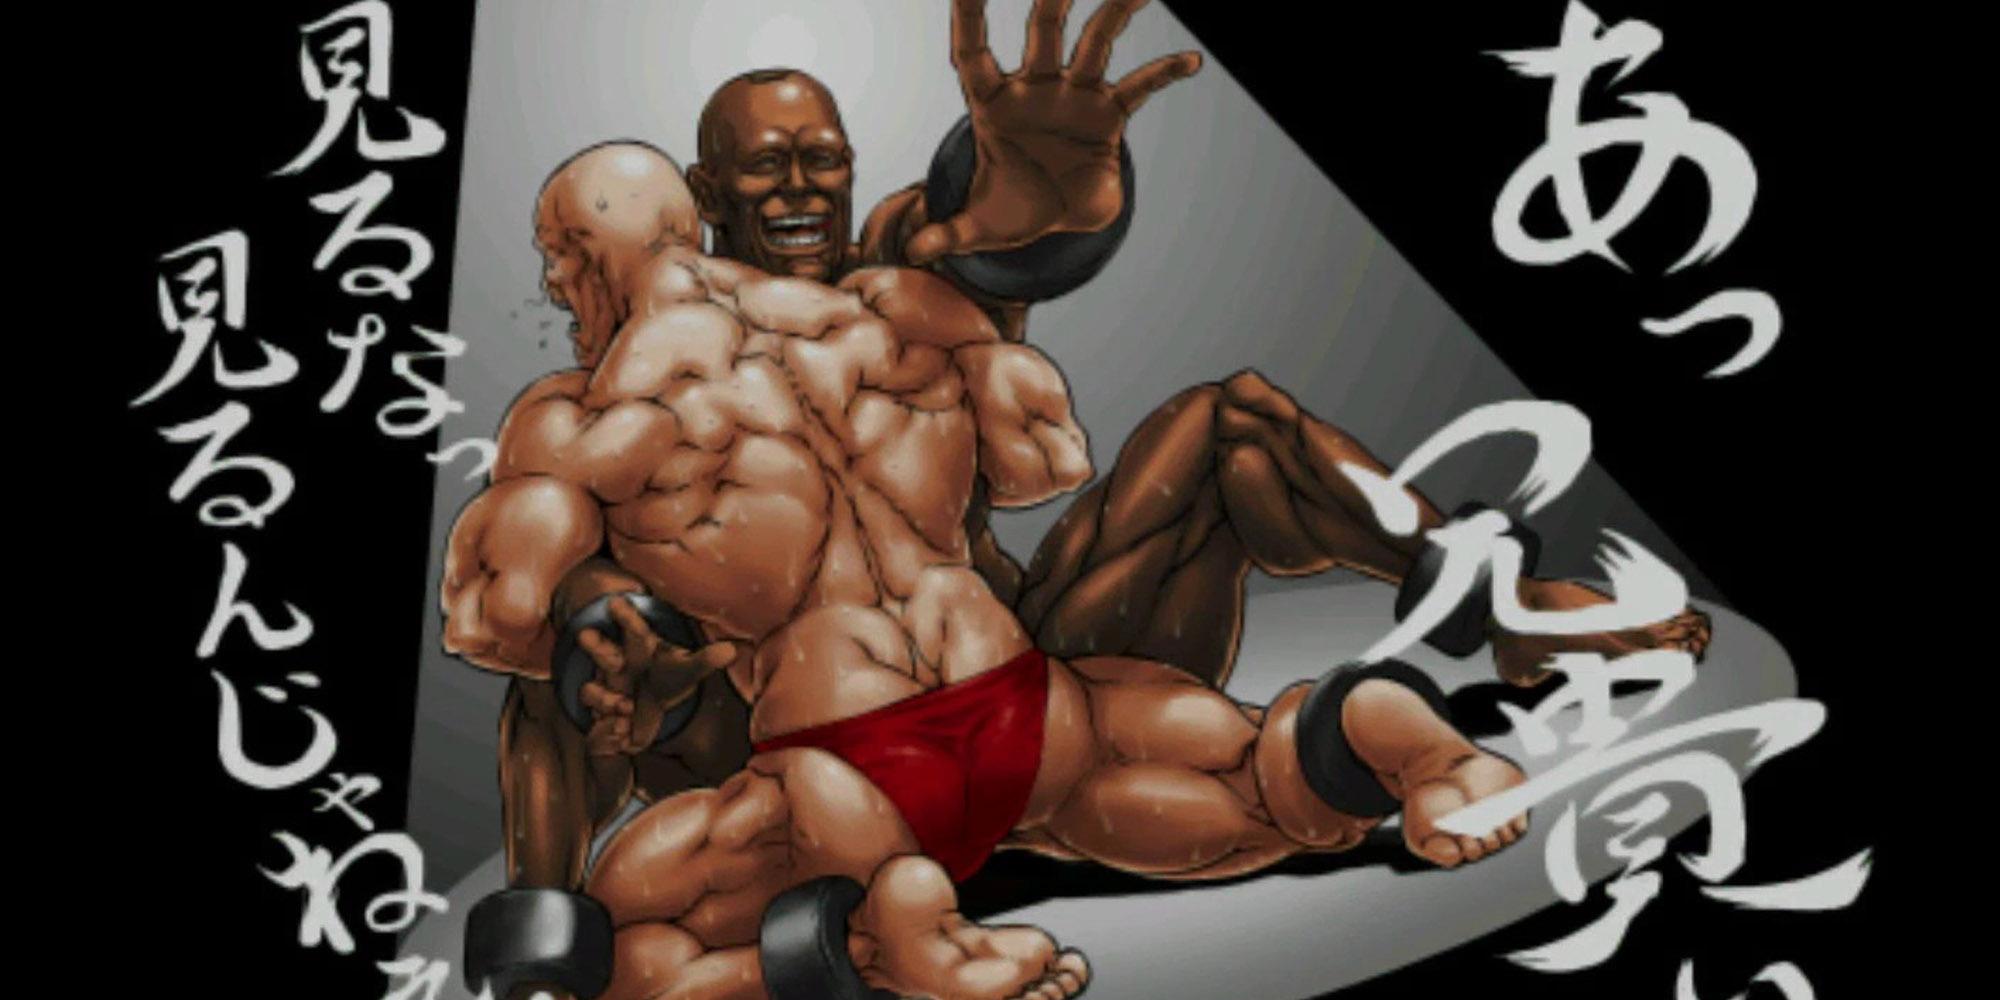 Sexy Gay Video Games, Cho Aniki